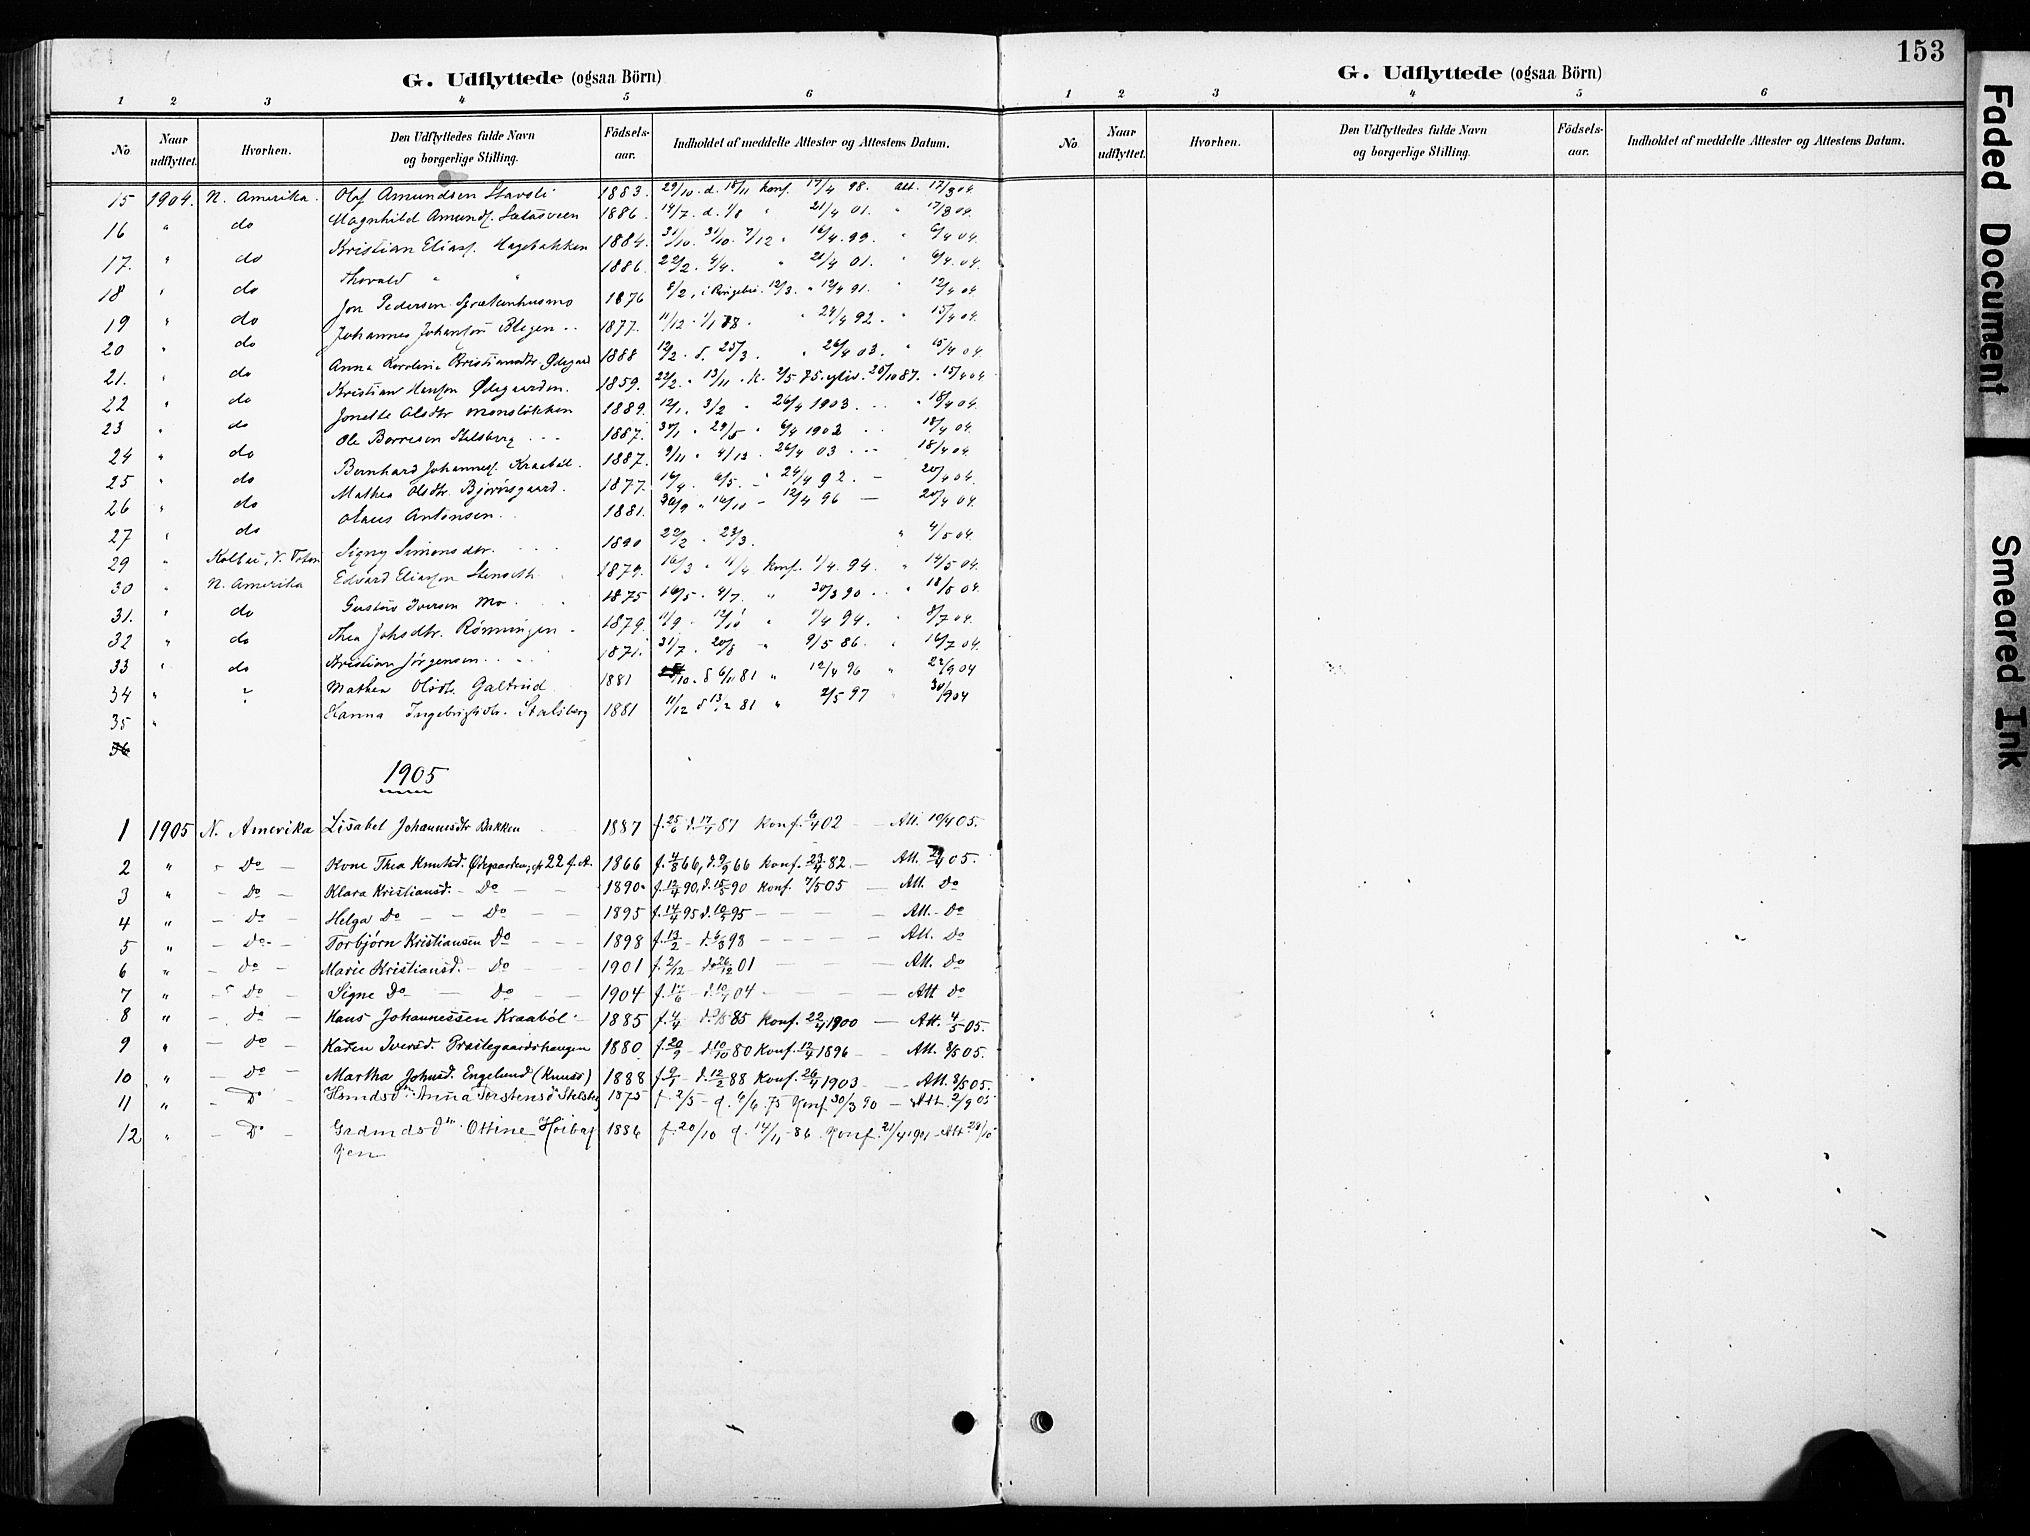 SAH, Øyer prestekontor, Ministerialbok nr. 11, 1894-1905, s. 153